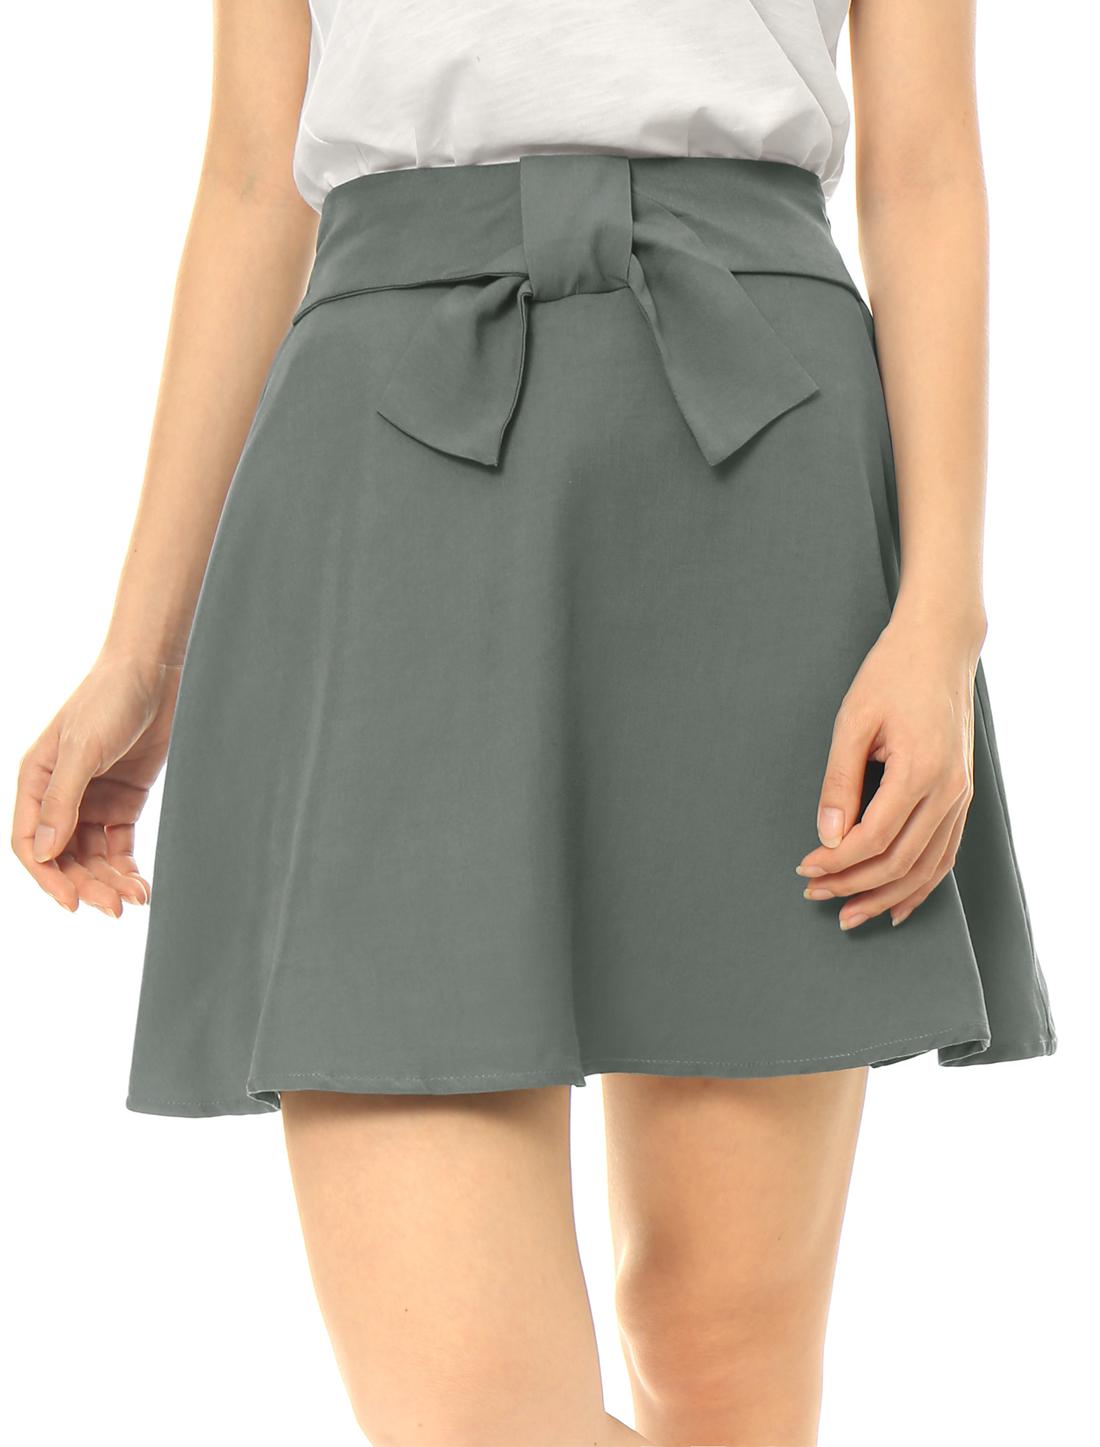 Women Partial Elastic Waist Bow Front Above Knee A-Line Skirt Gray XL